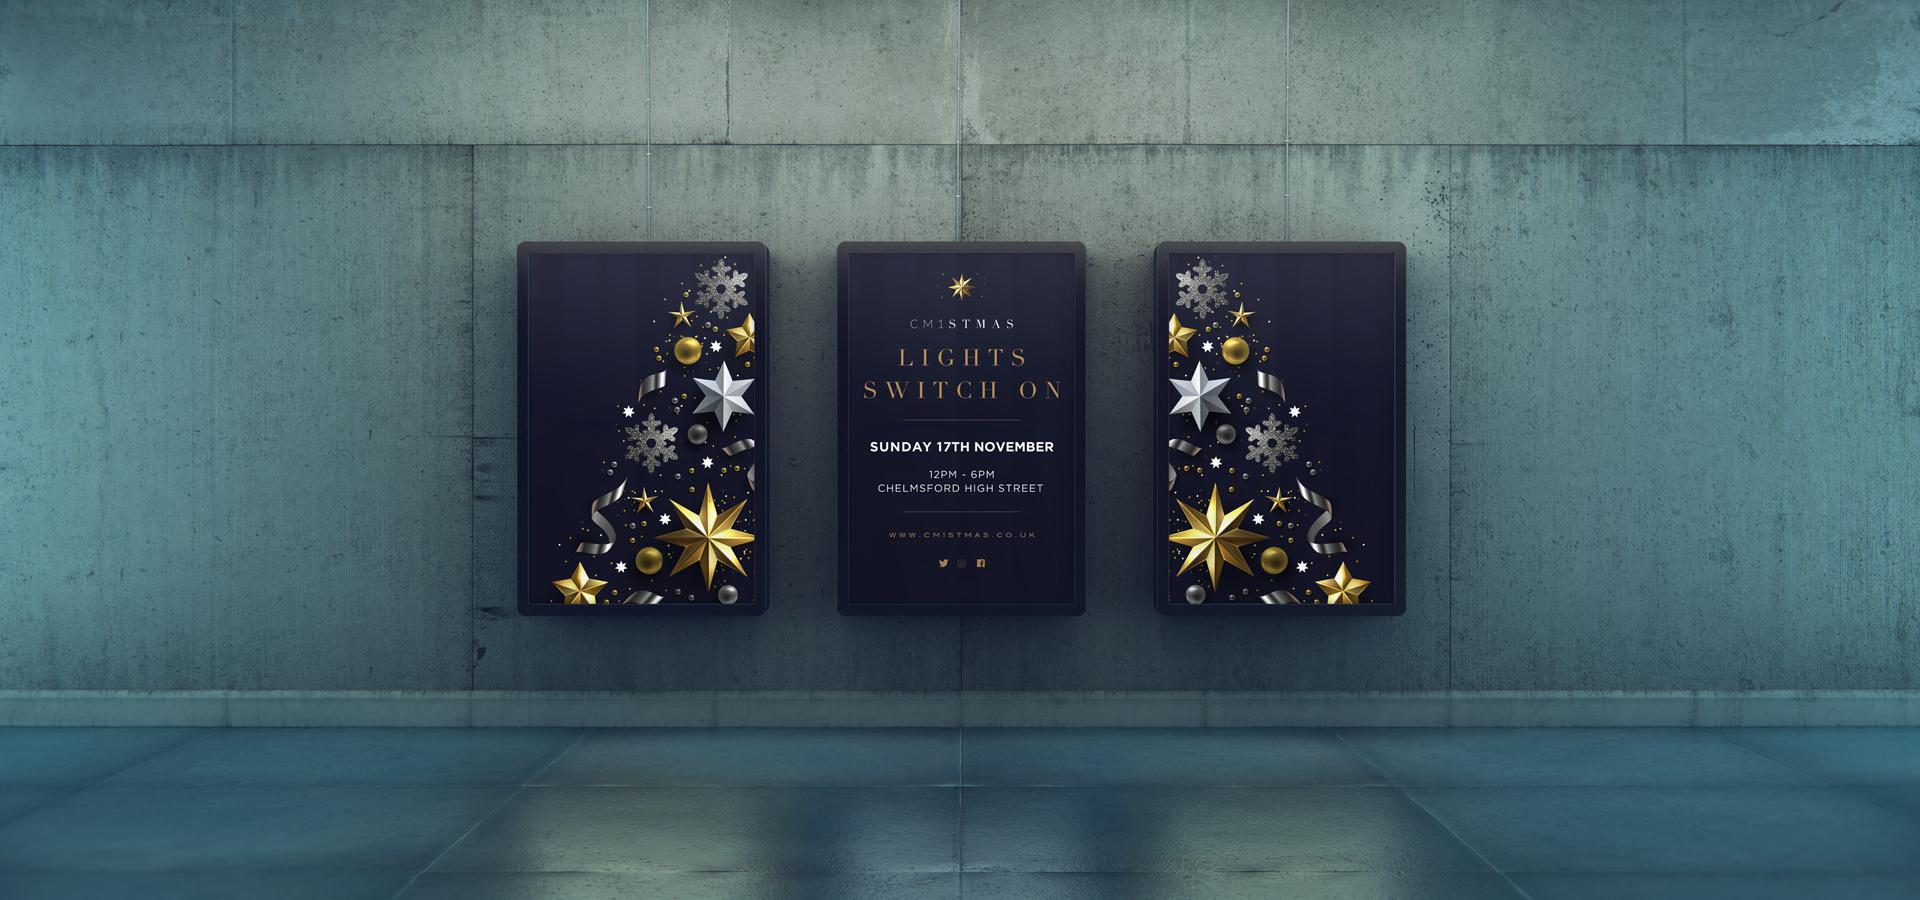 CM1stmas Chelmsford Christmas digital adverts